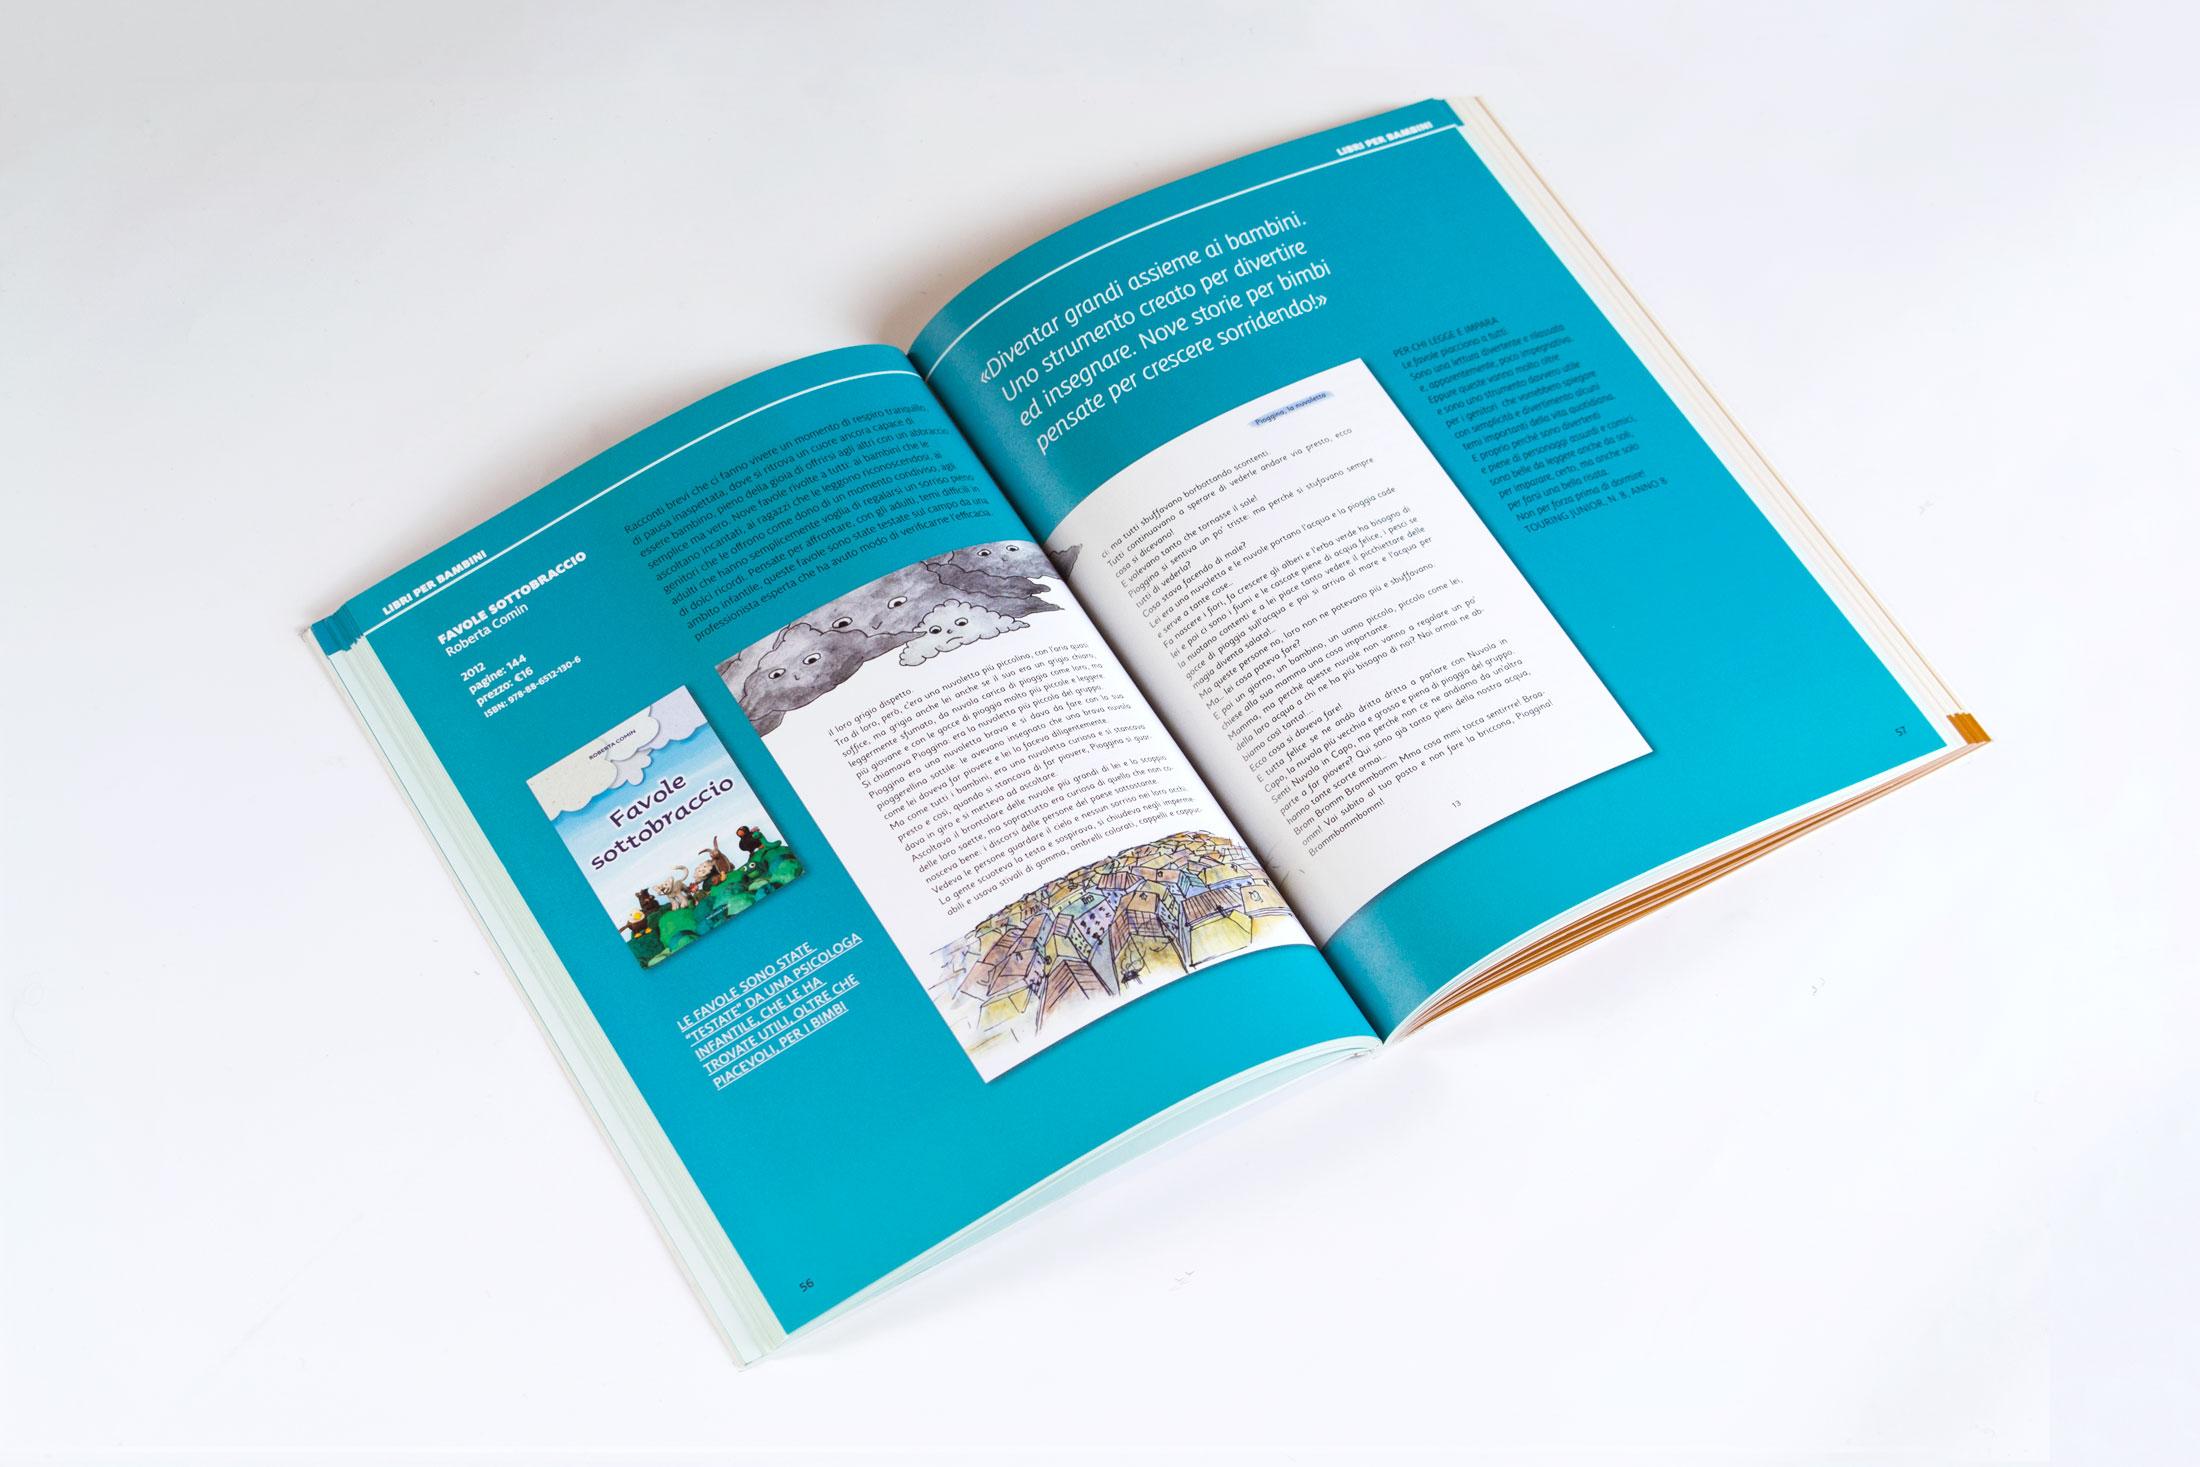 Catalogo Marcianum Press - interno 7